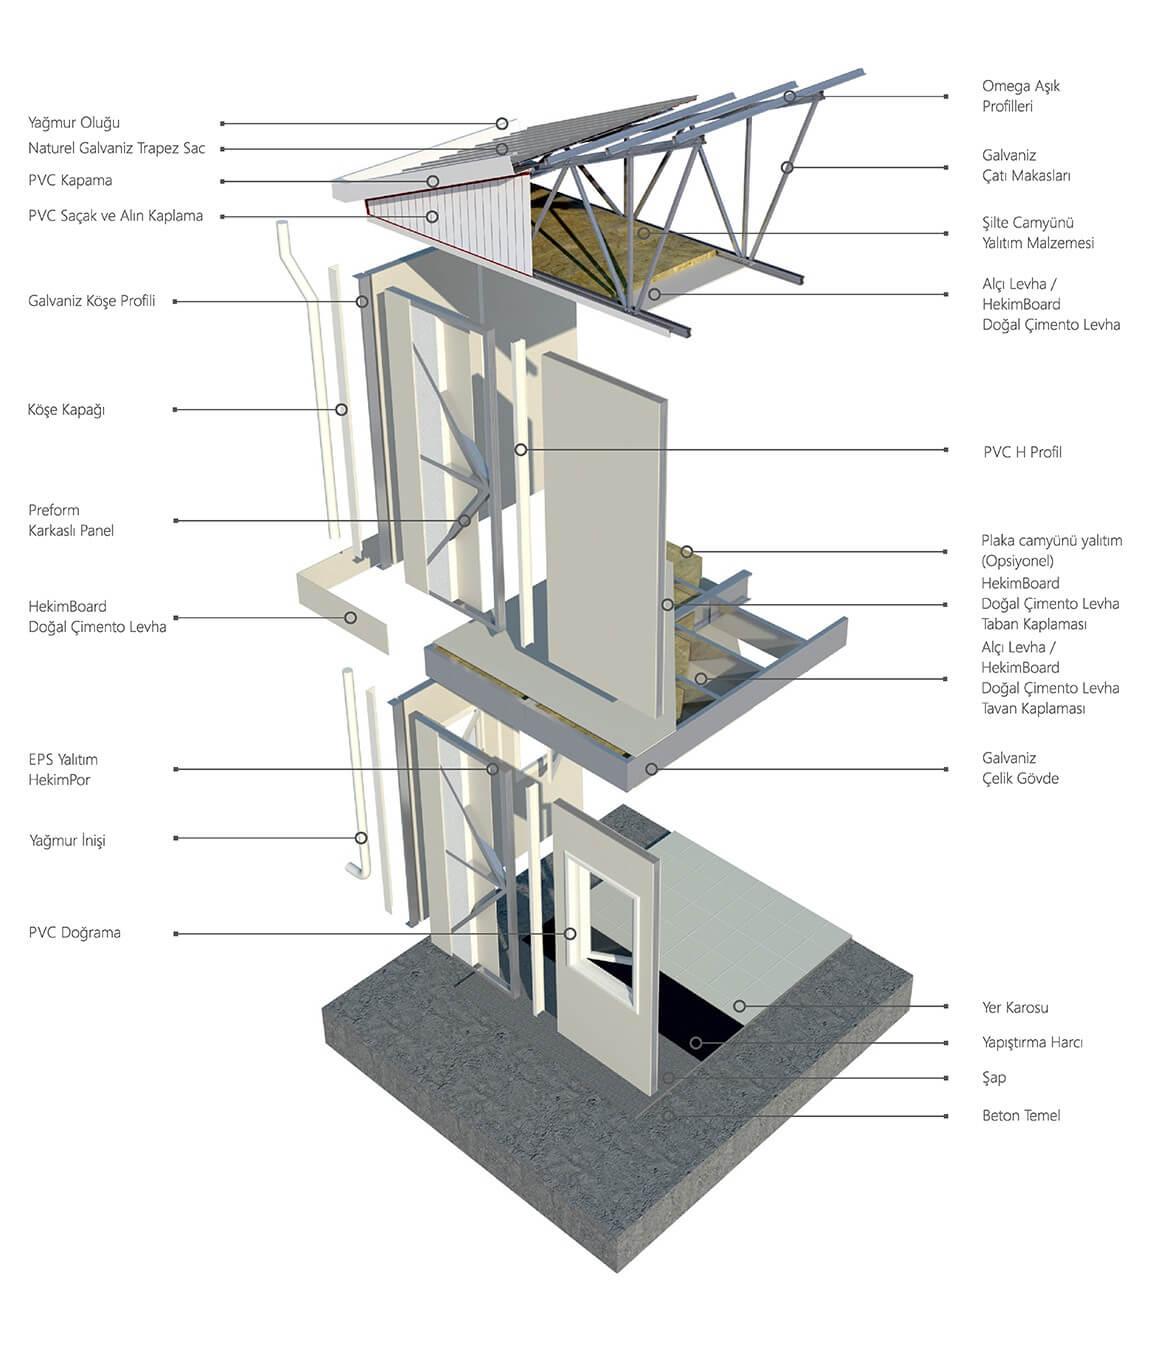 karkasli-panel-sistem